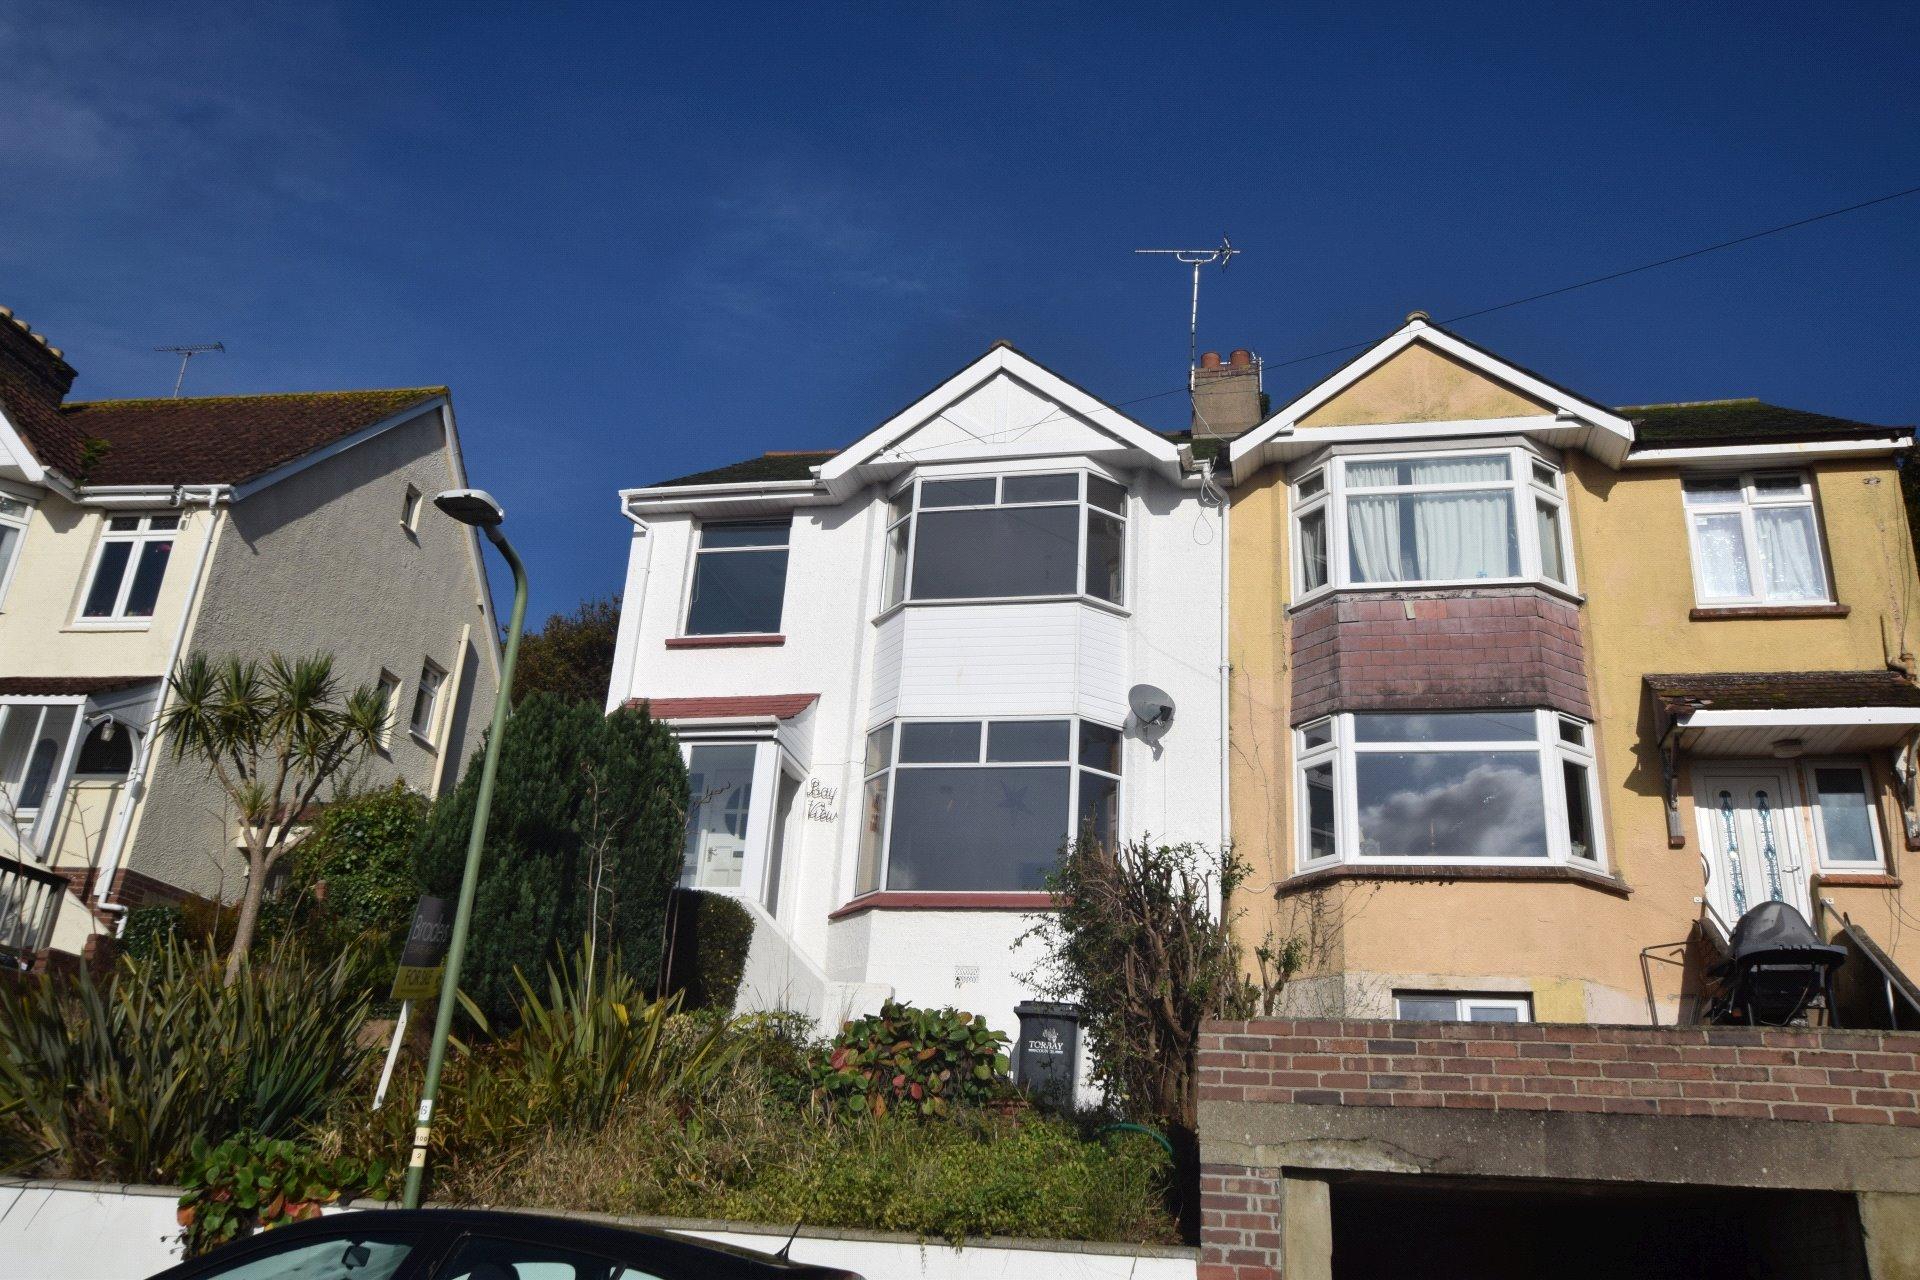 4 Bedroom Property For Sale In Langdon Road Paignton Devon Tq3